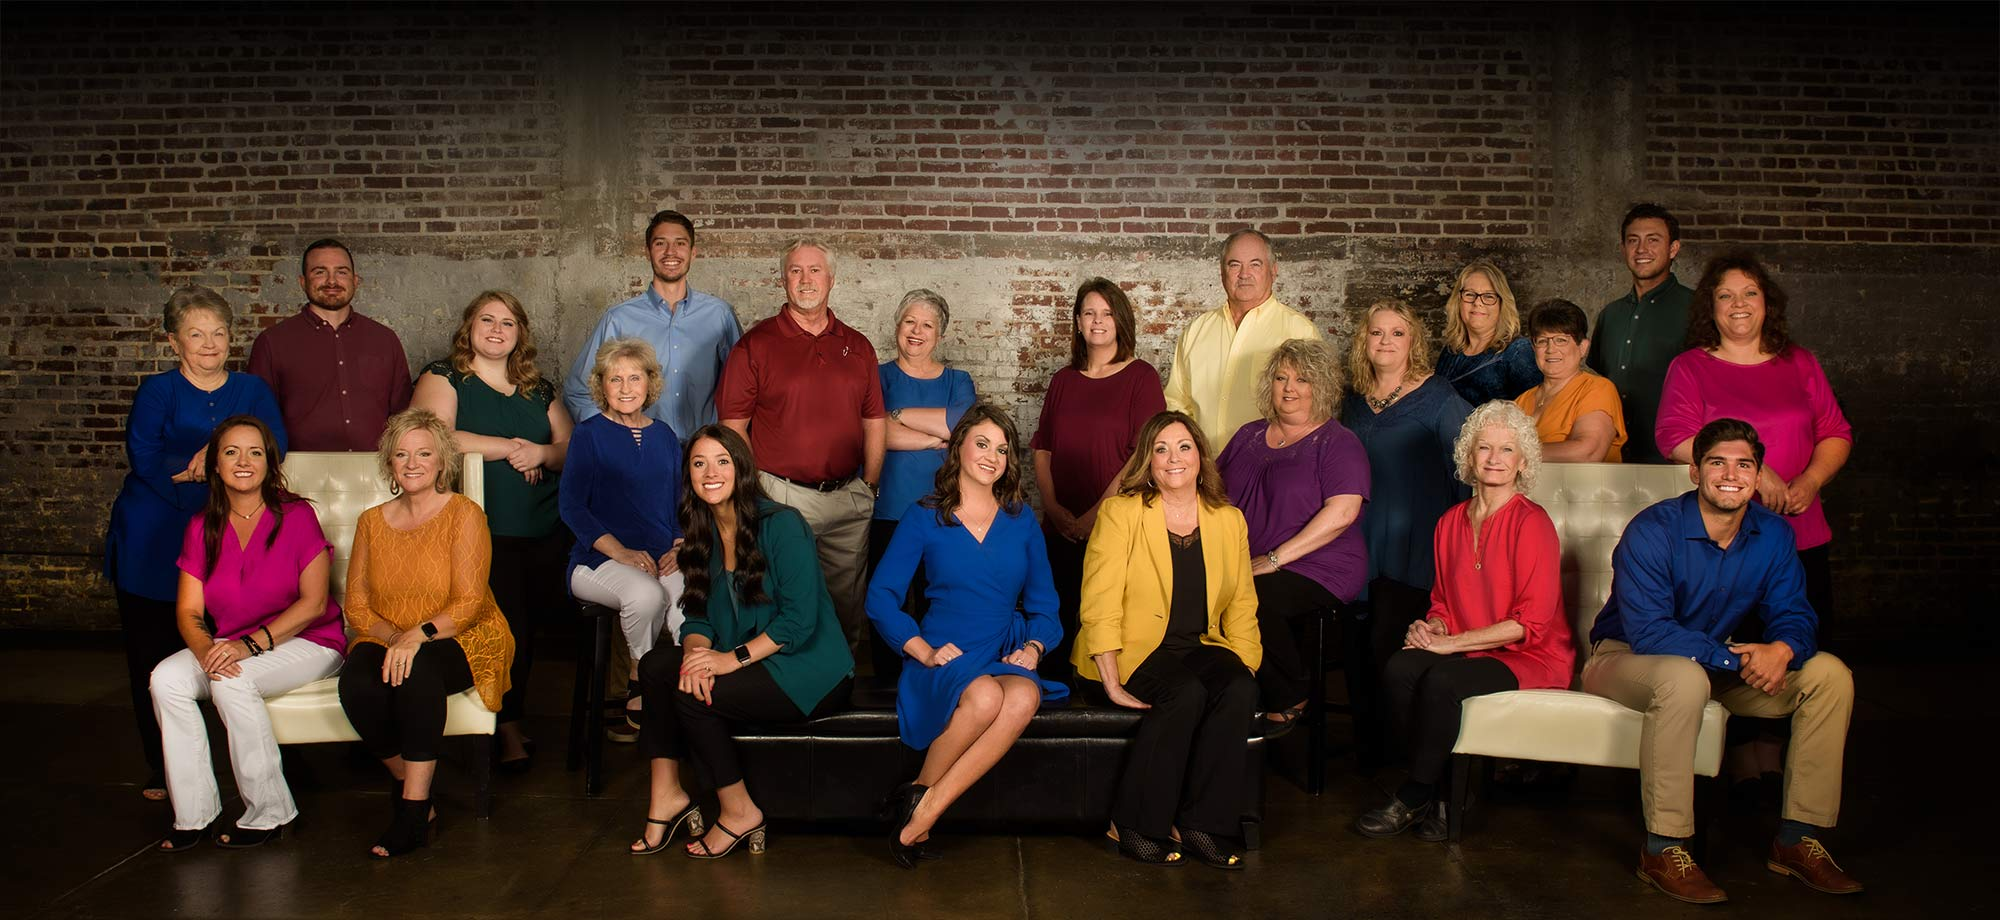 Ott Insurance associates group photo